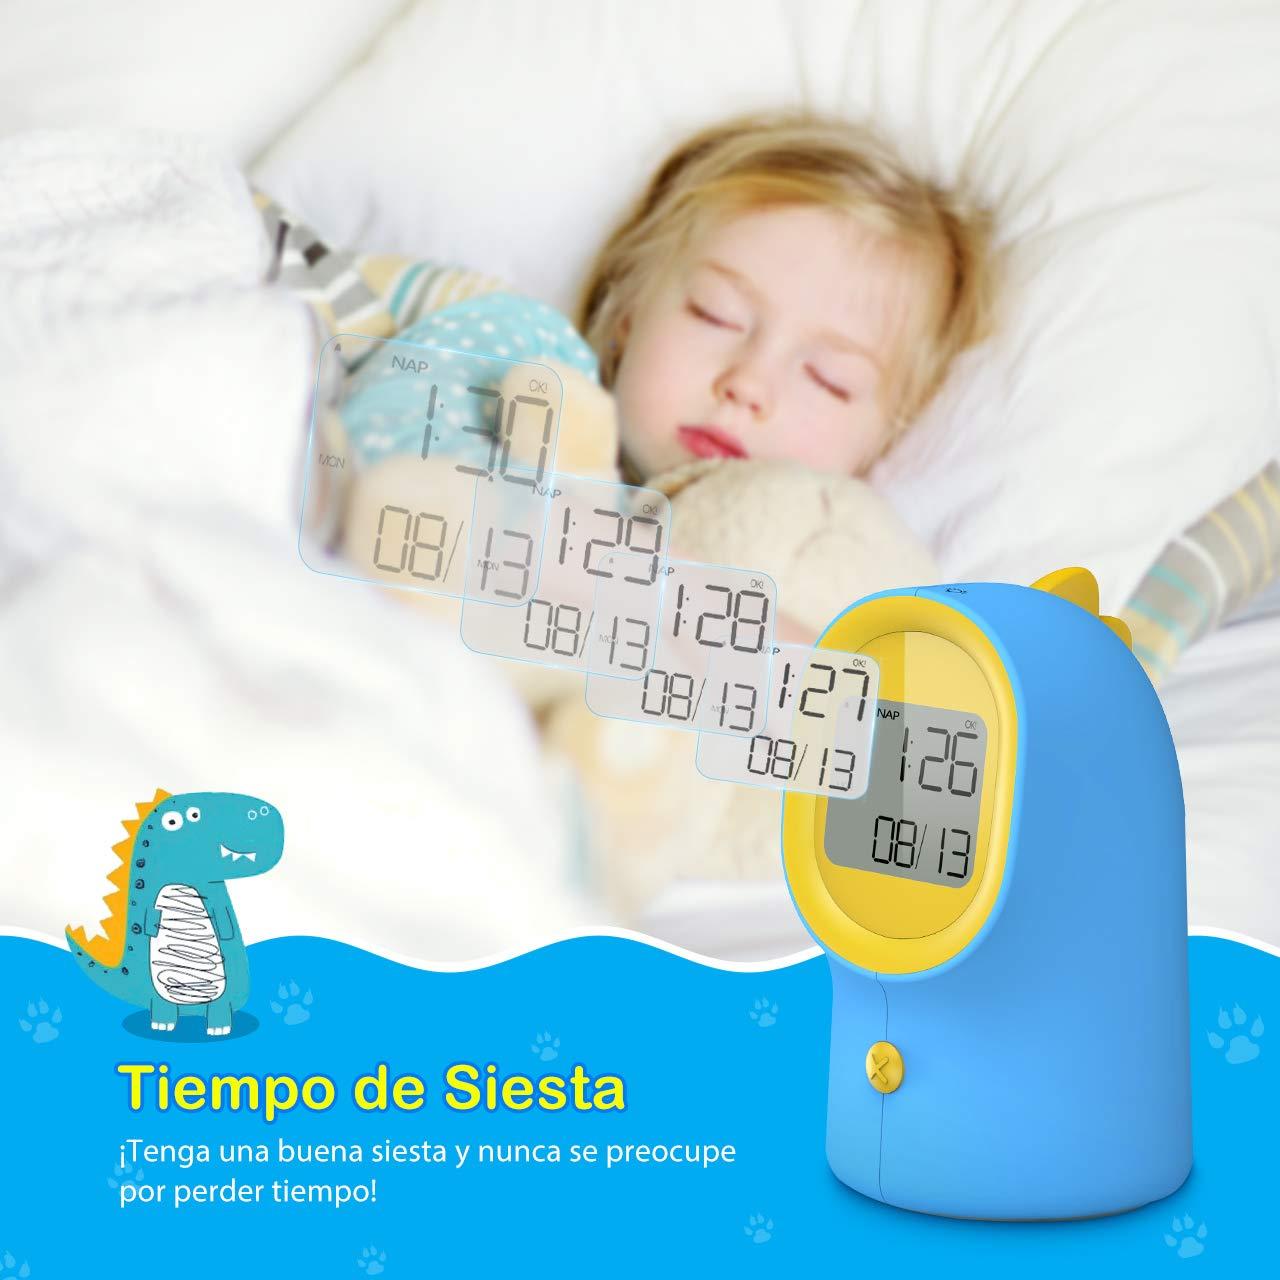 Holife Despertador Infantil, Despertador Digital para Niño con Luz Nocturna, Función Snooze/Siesta, 2 Sonido& Volumen, Reloj con Calendario, Niños Aprenden ...